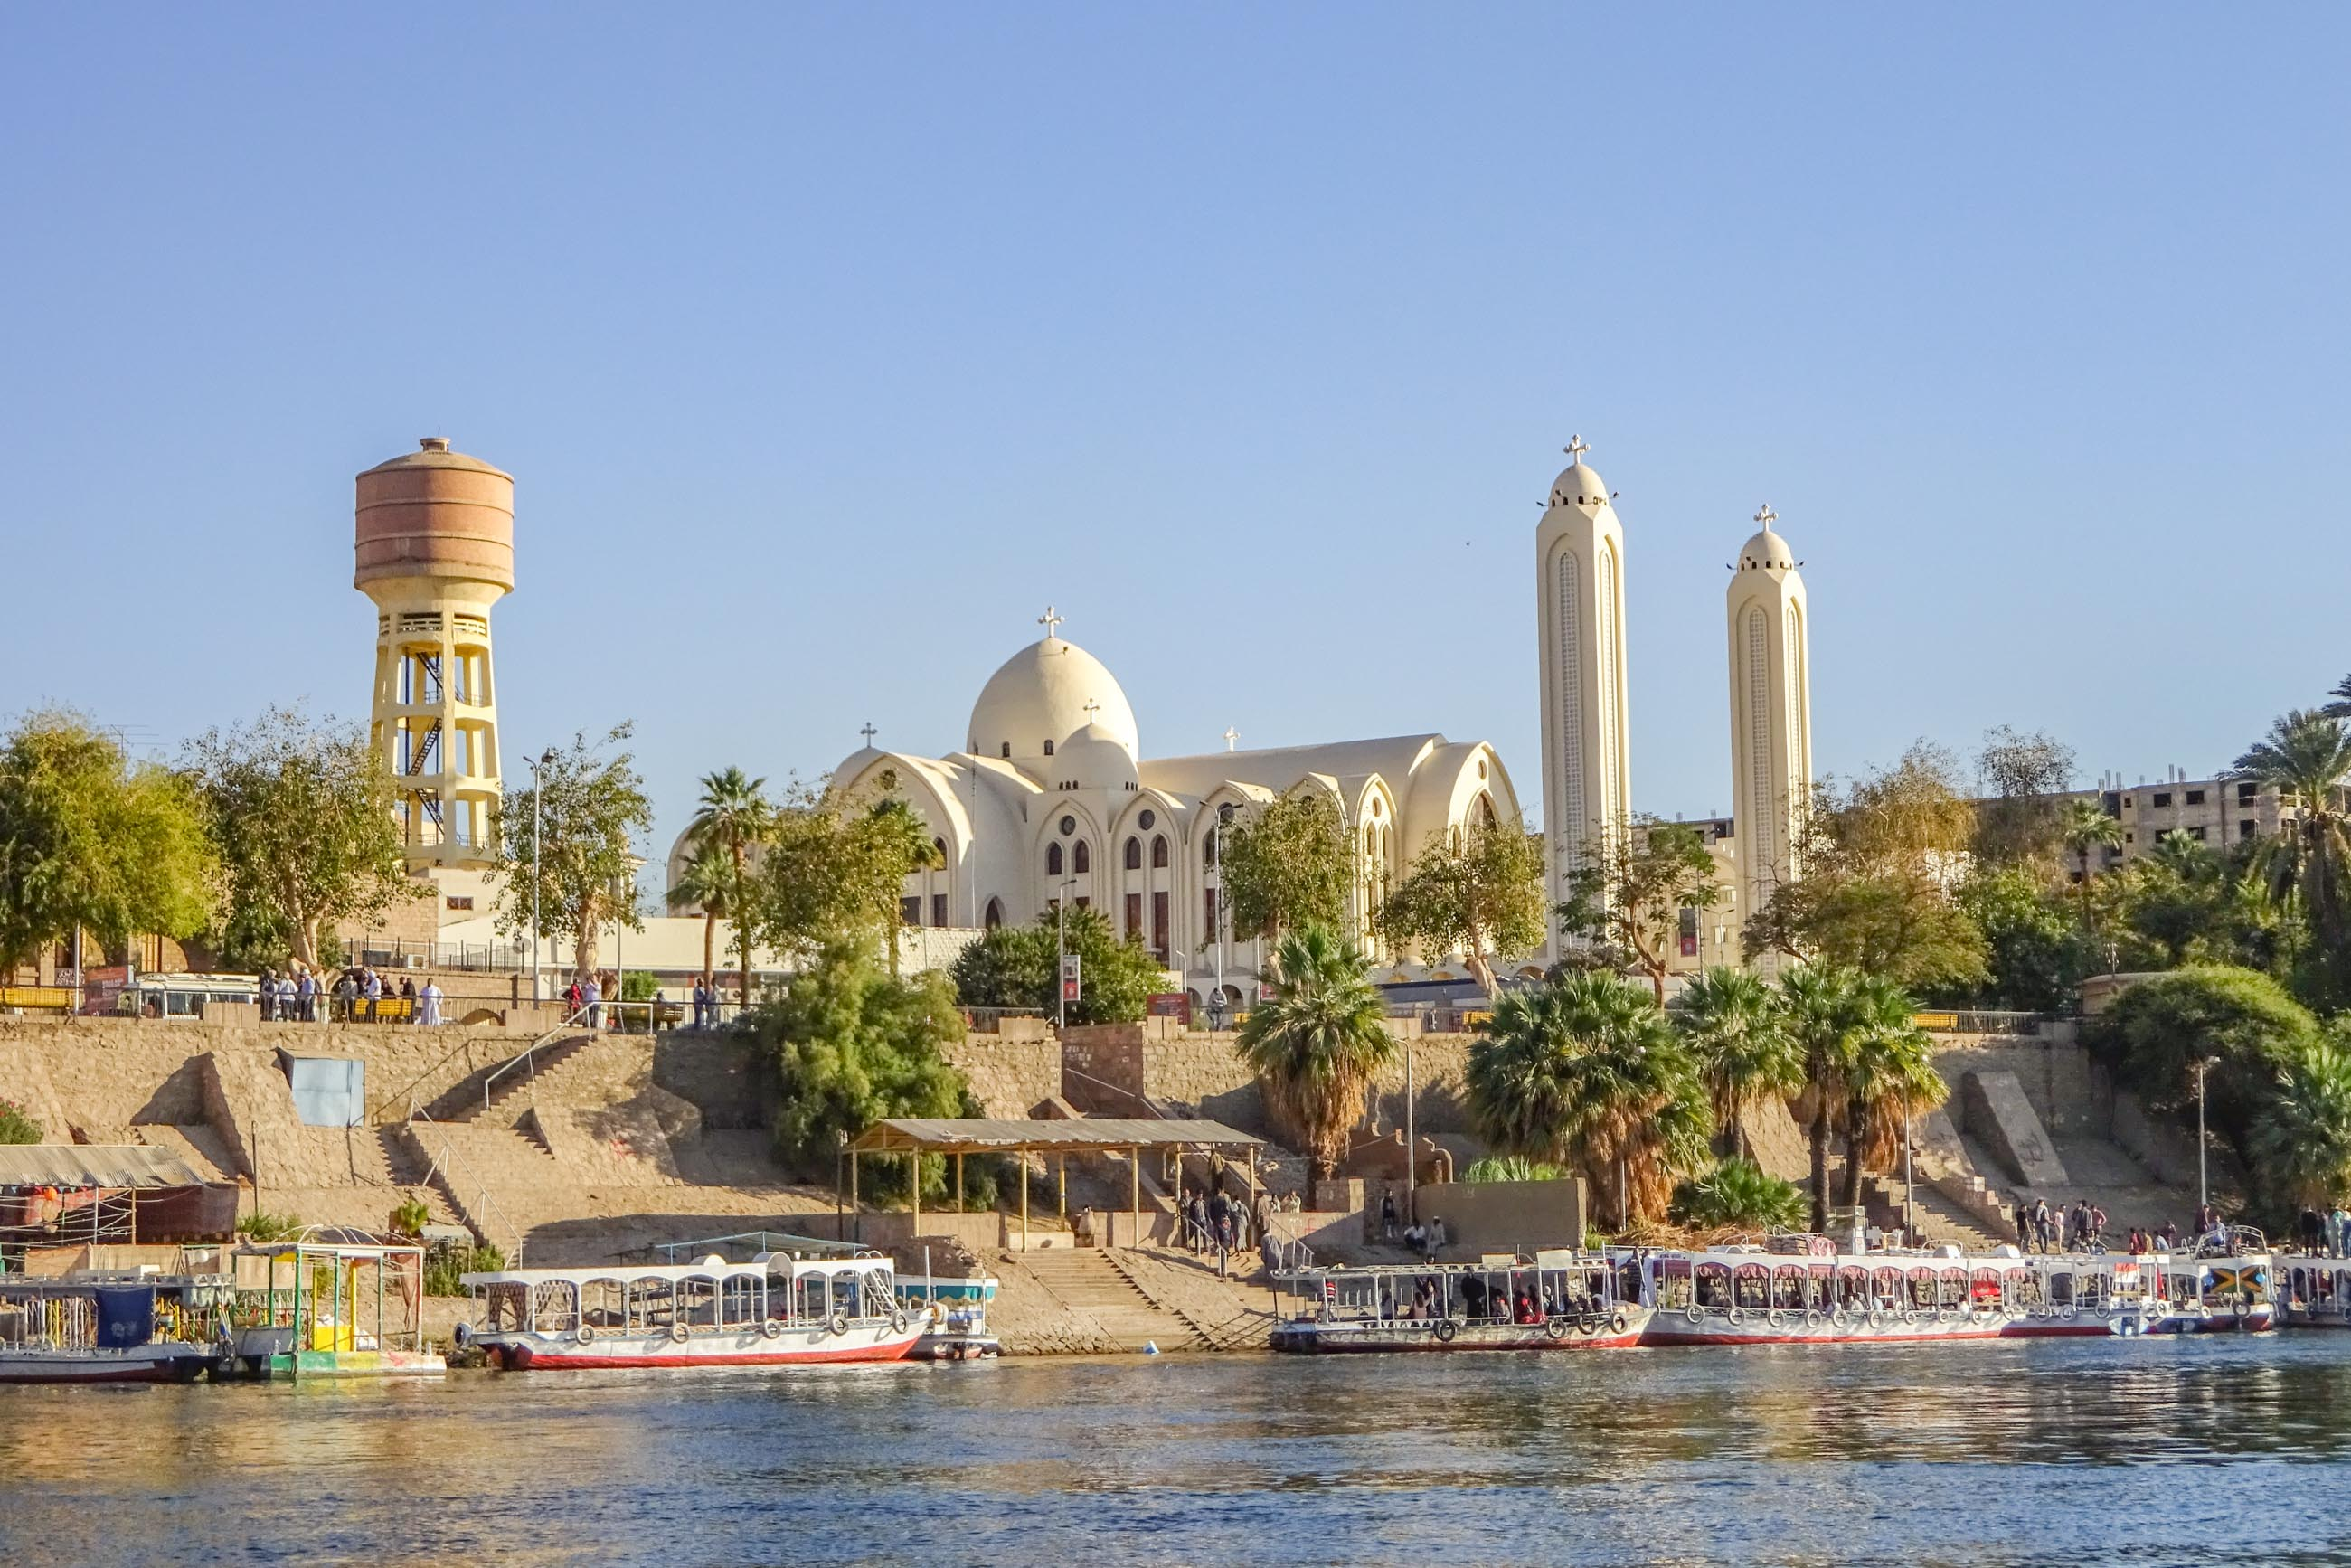 https://bubo.sk/uploads/galleries/18745/miroslavadlha_egypt_aswan-62-.jpg